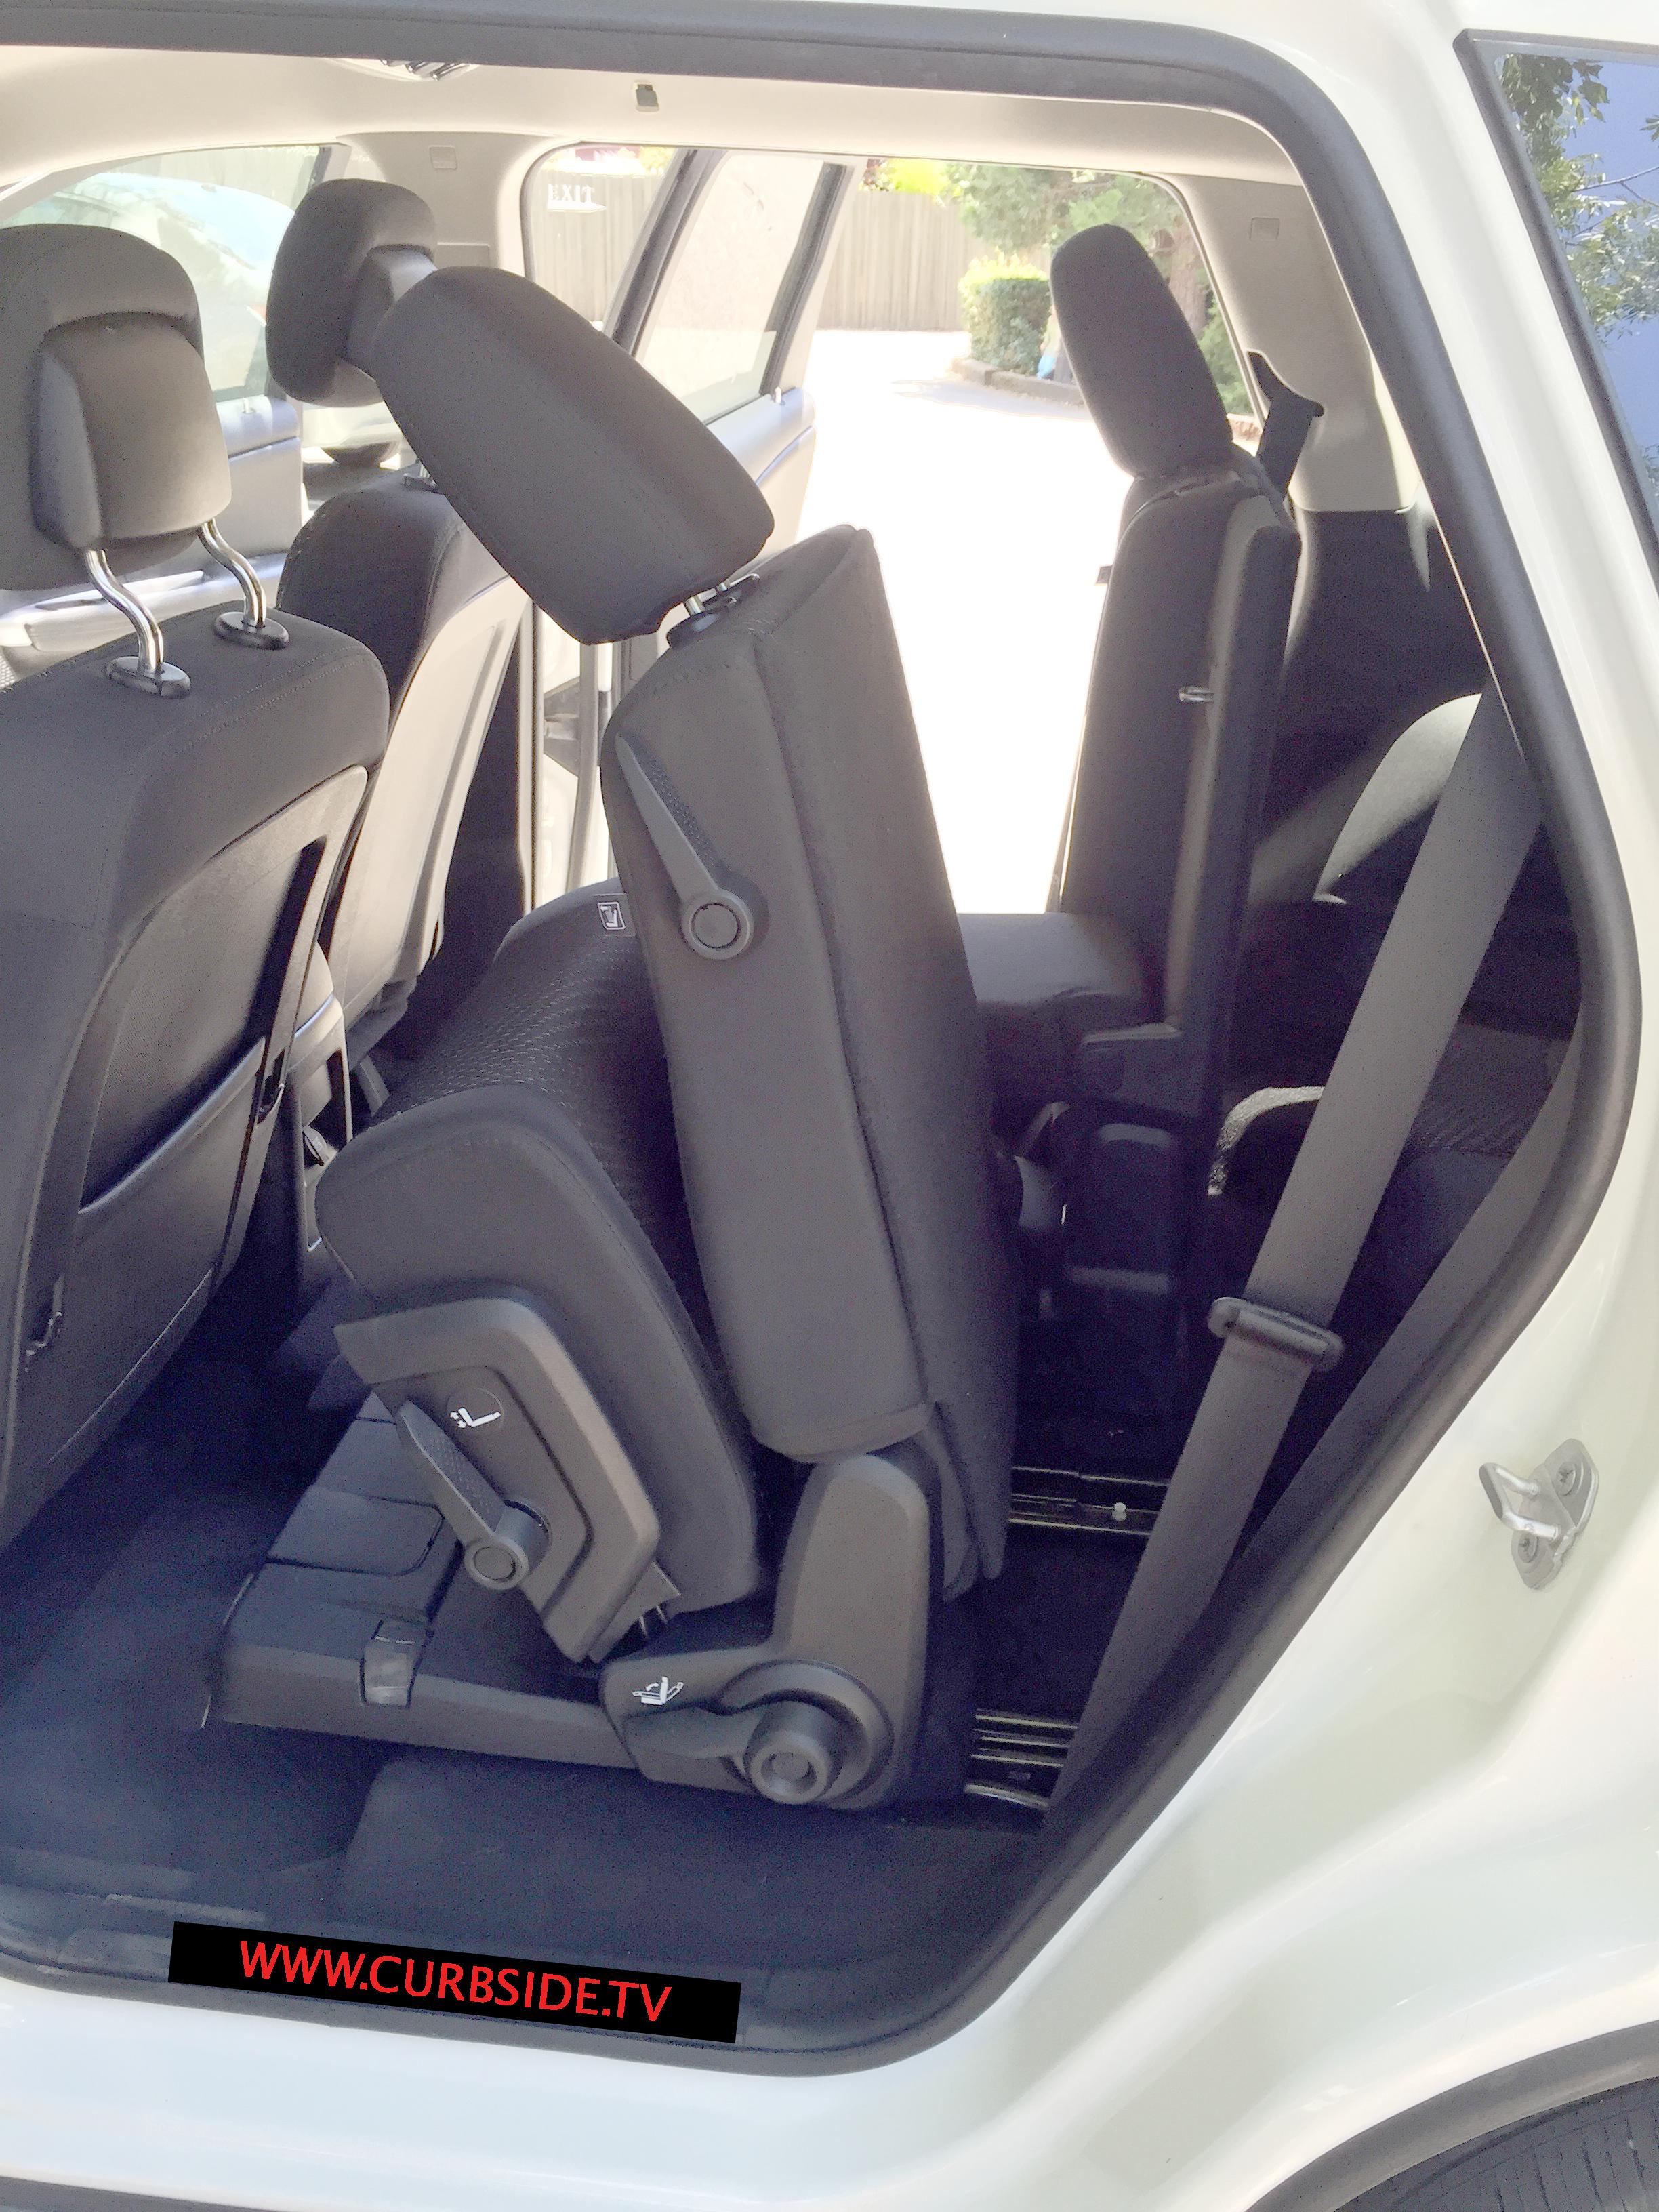 Dodge-Journey-rear-seat-flexibilty.png